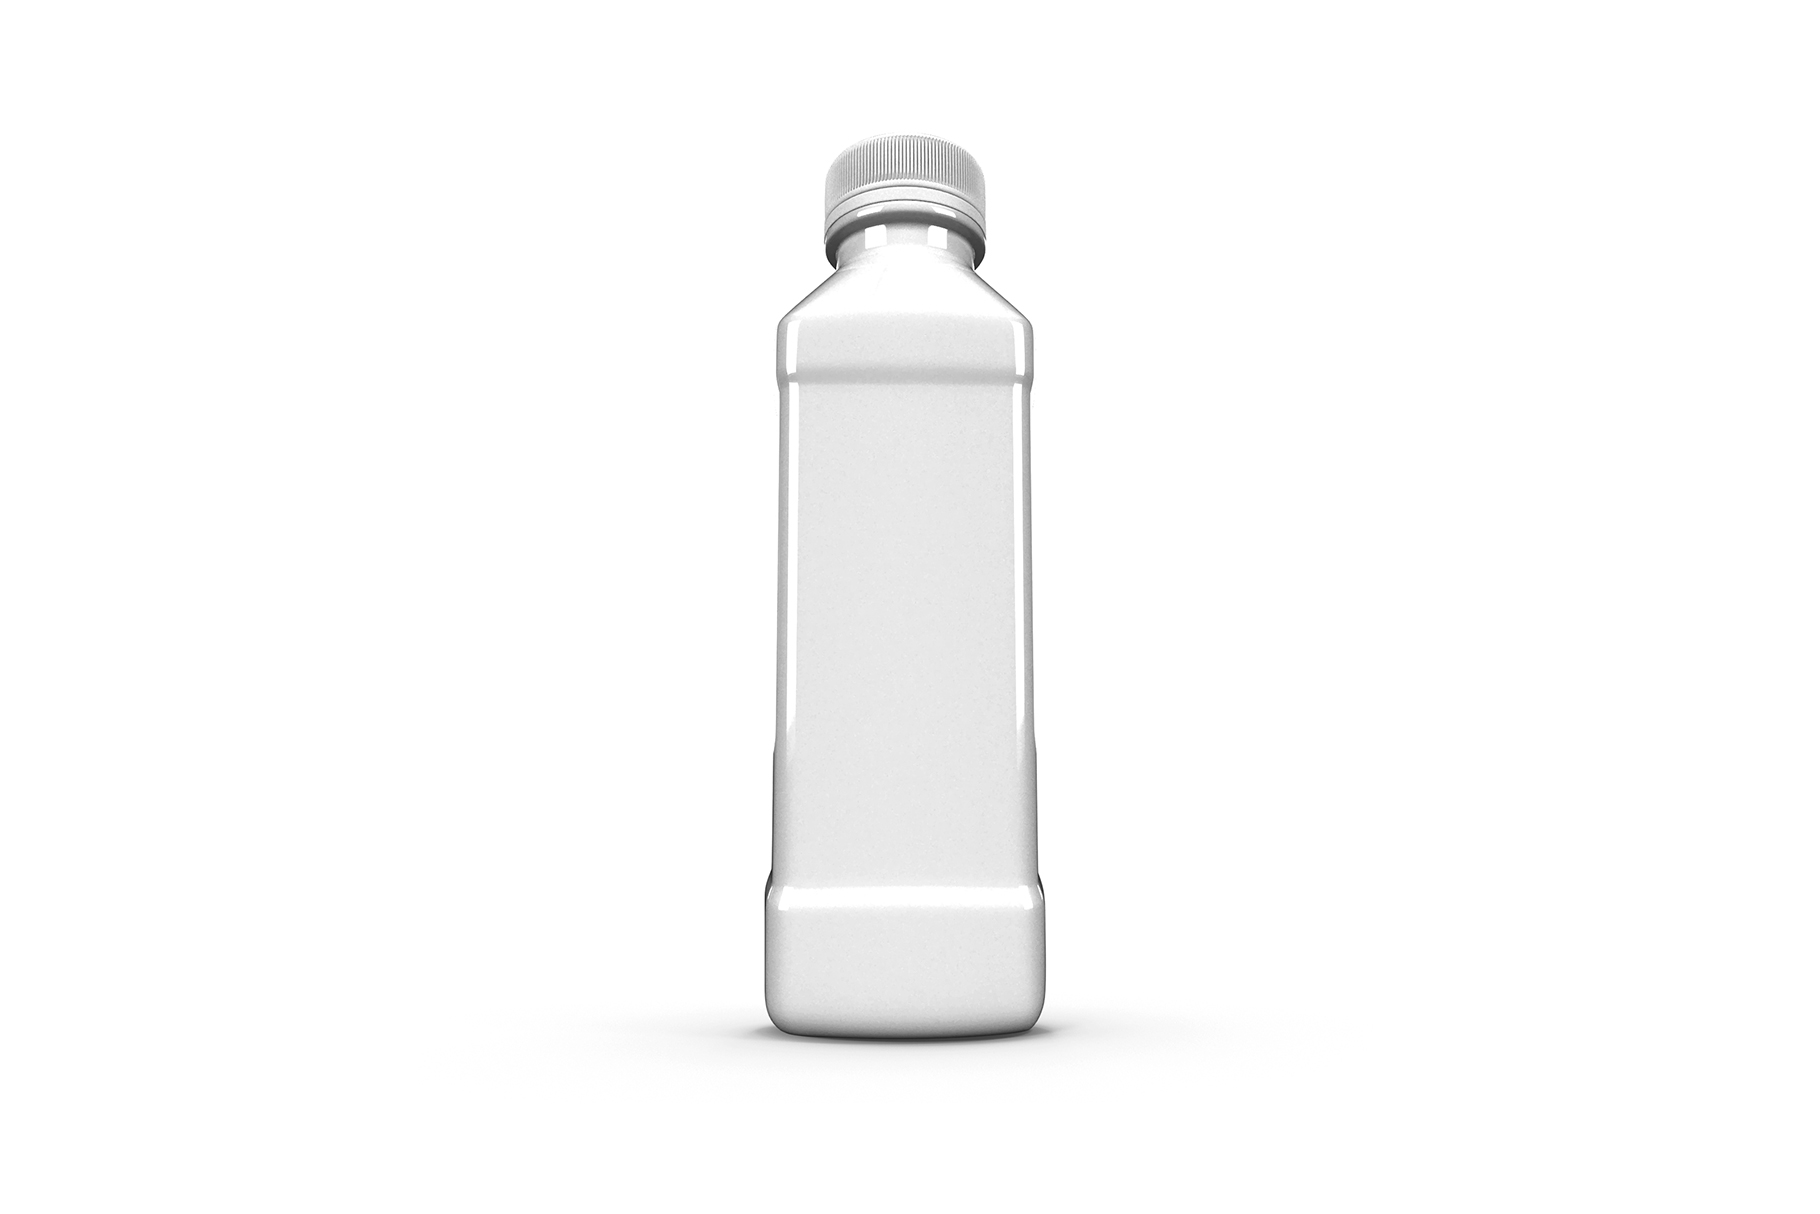 Bottle Juice Mockup Advertising example image 10